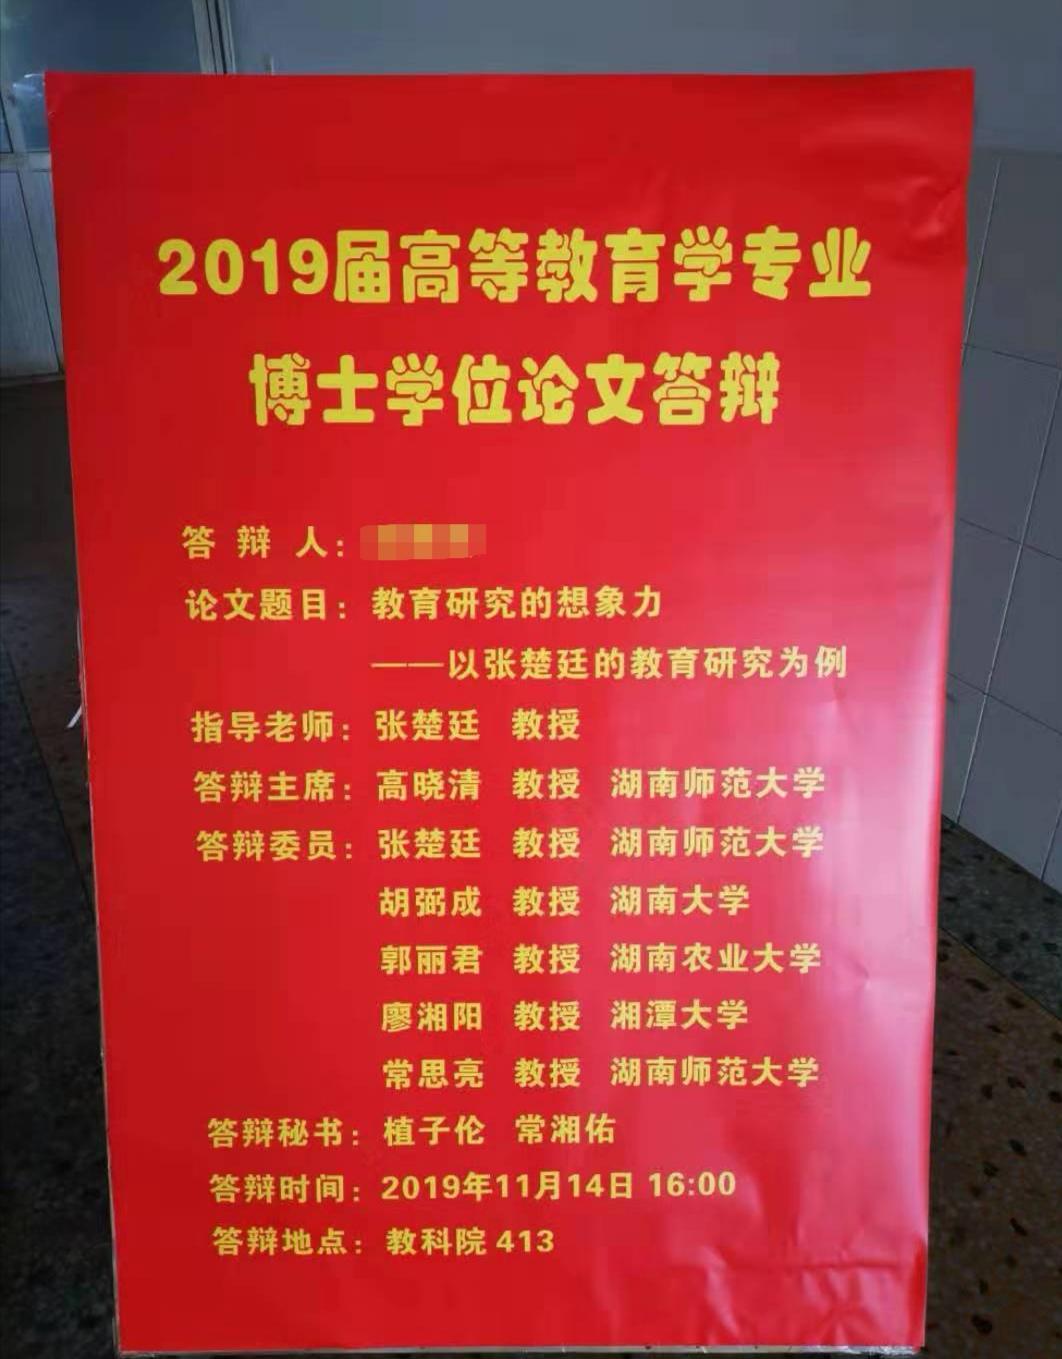 http://www.hunanpp.com/caijingfenxi/98028.html